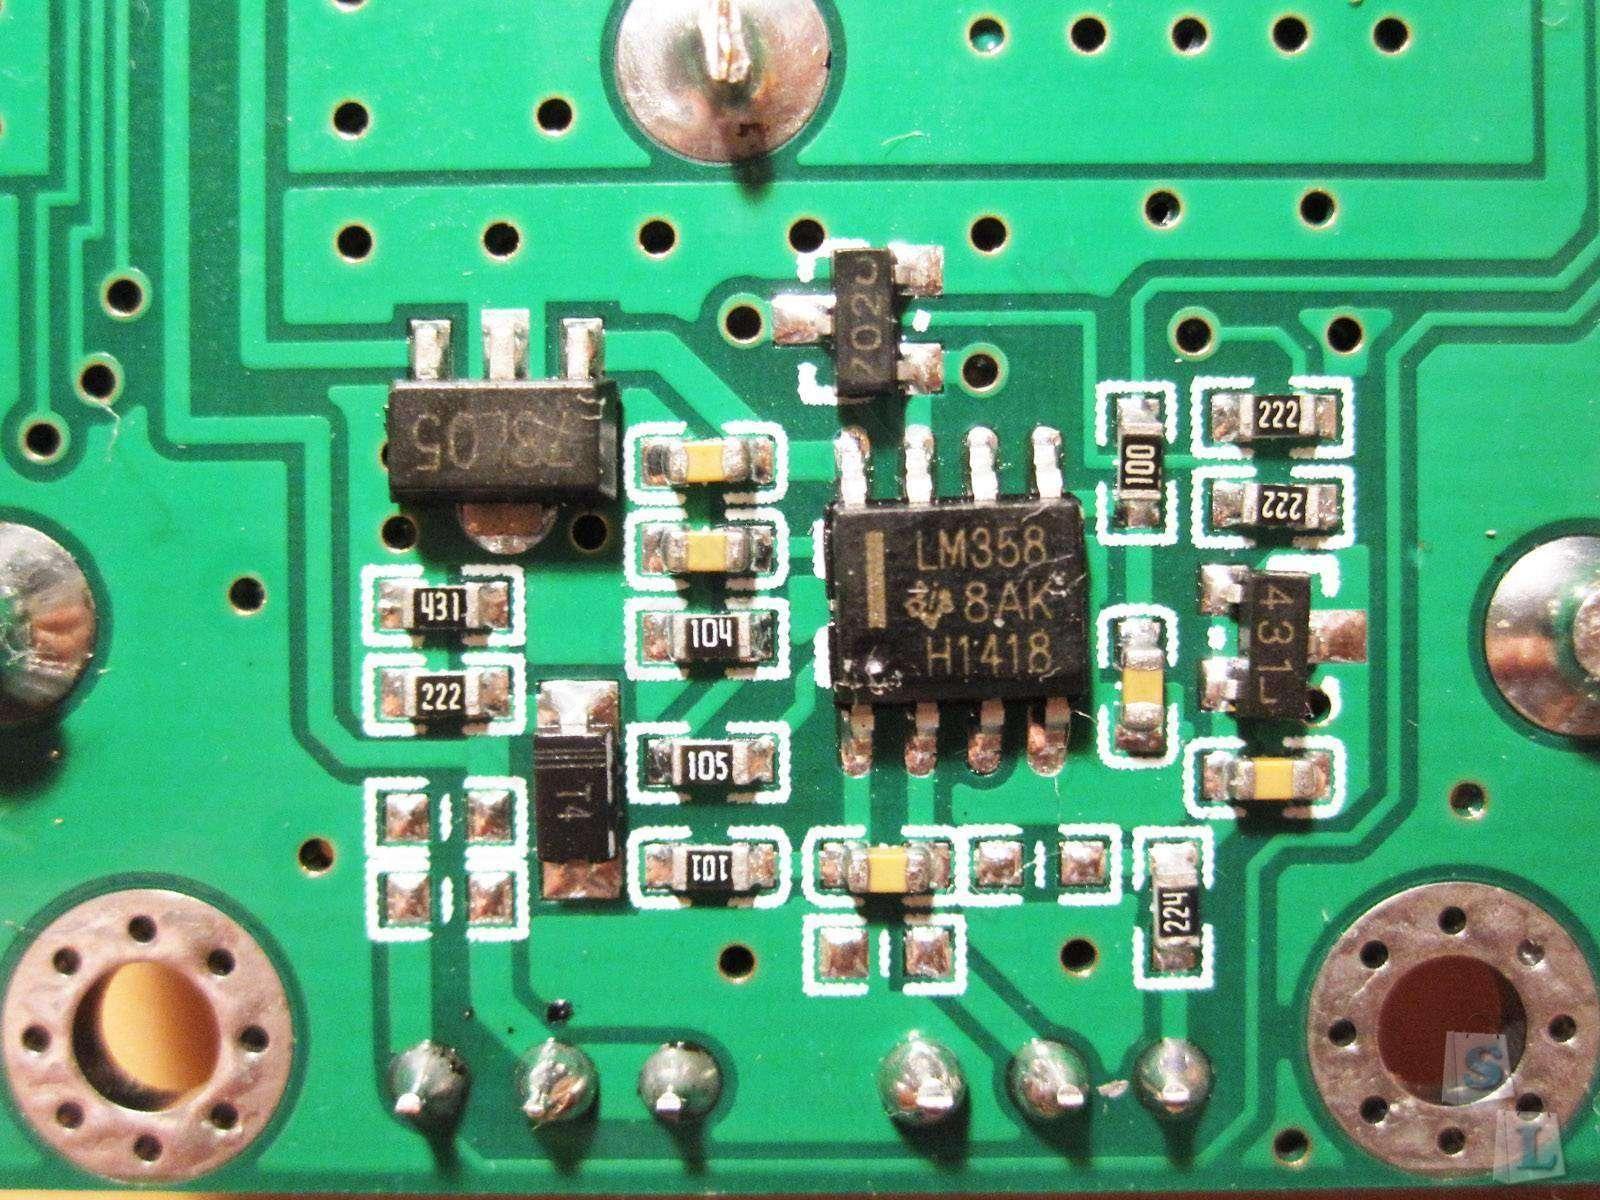 Banggood: DC-DC Step Down модуль с заявленным током в 10 Ампер